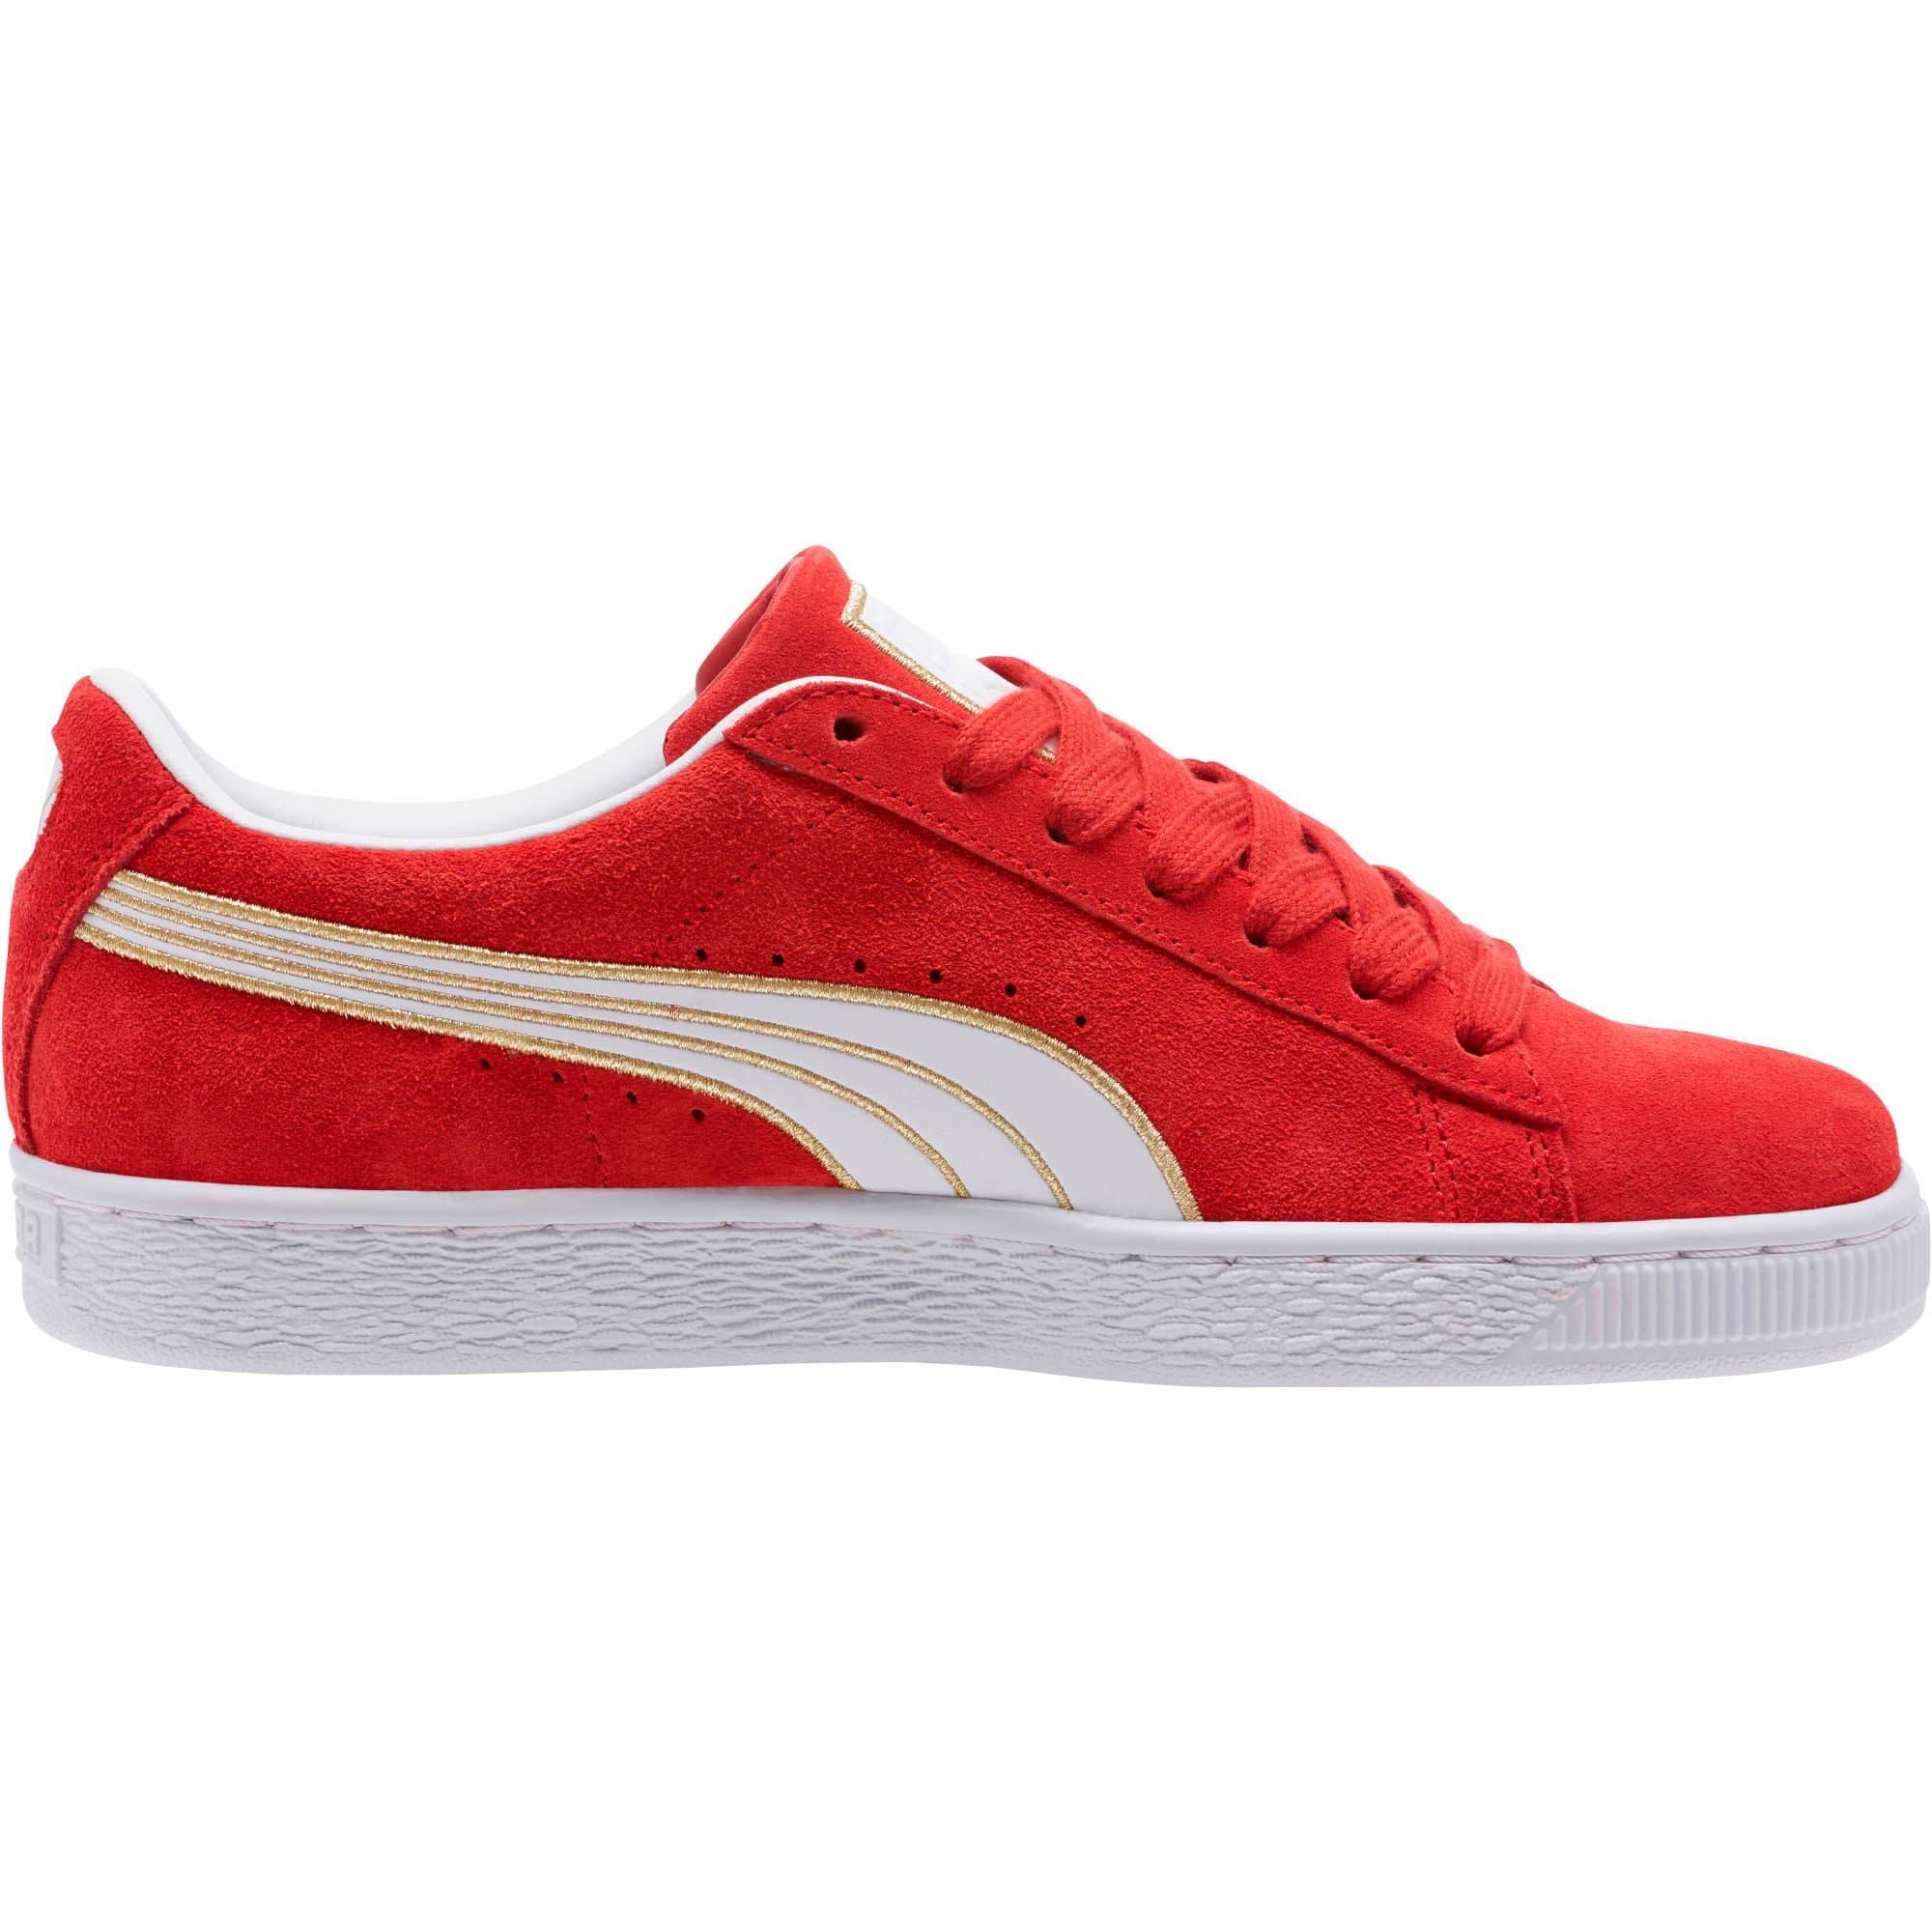 Thumbnail 3 of Suede Varsity Women's Sneakers, Ribbon Red-Puma White, medium